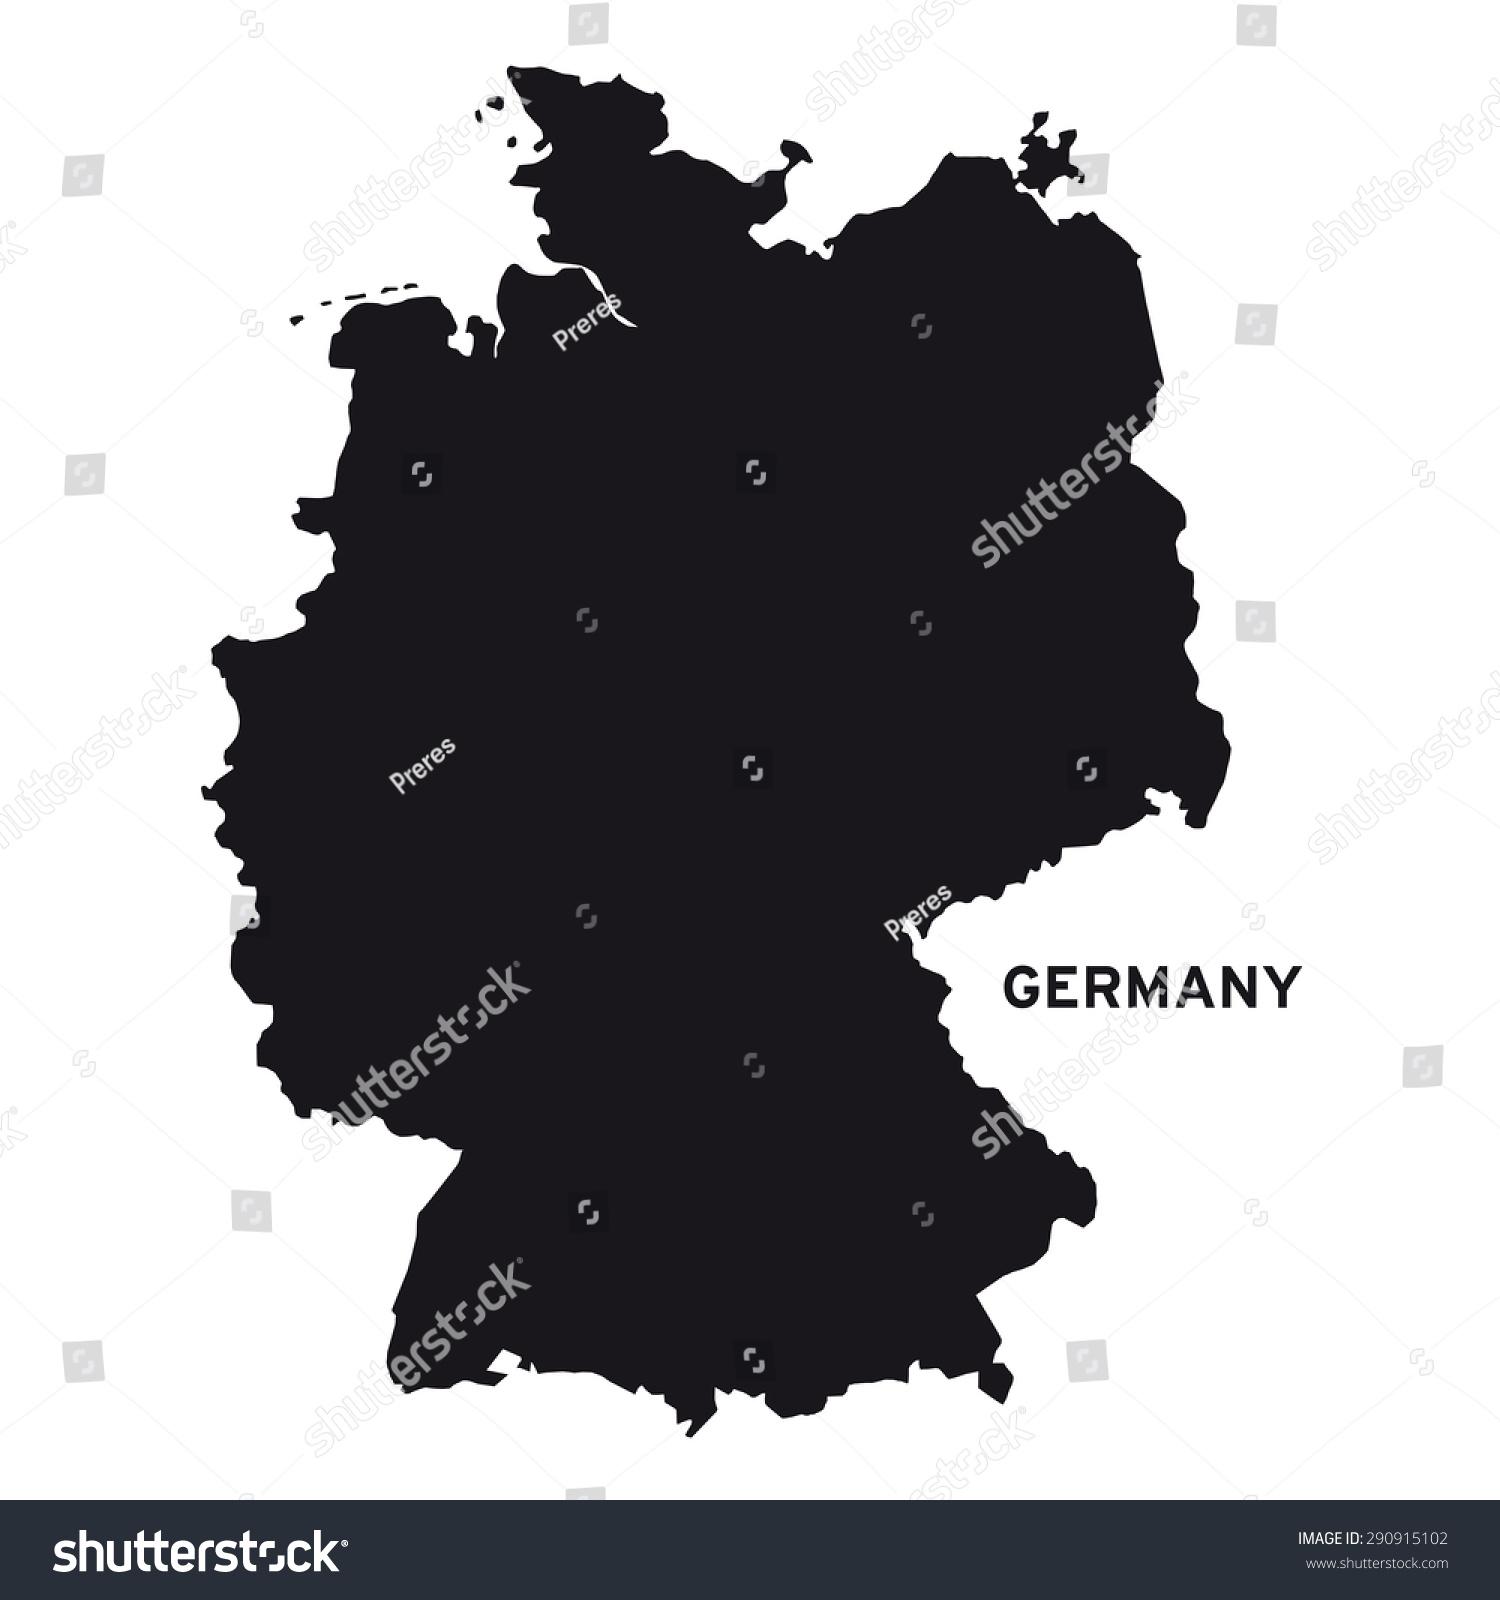 Germany Map Vector Stock Vector Shutterstock - Germany map vector